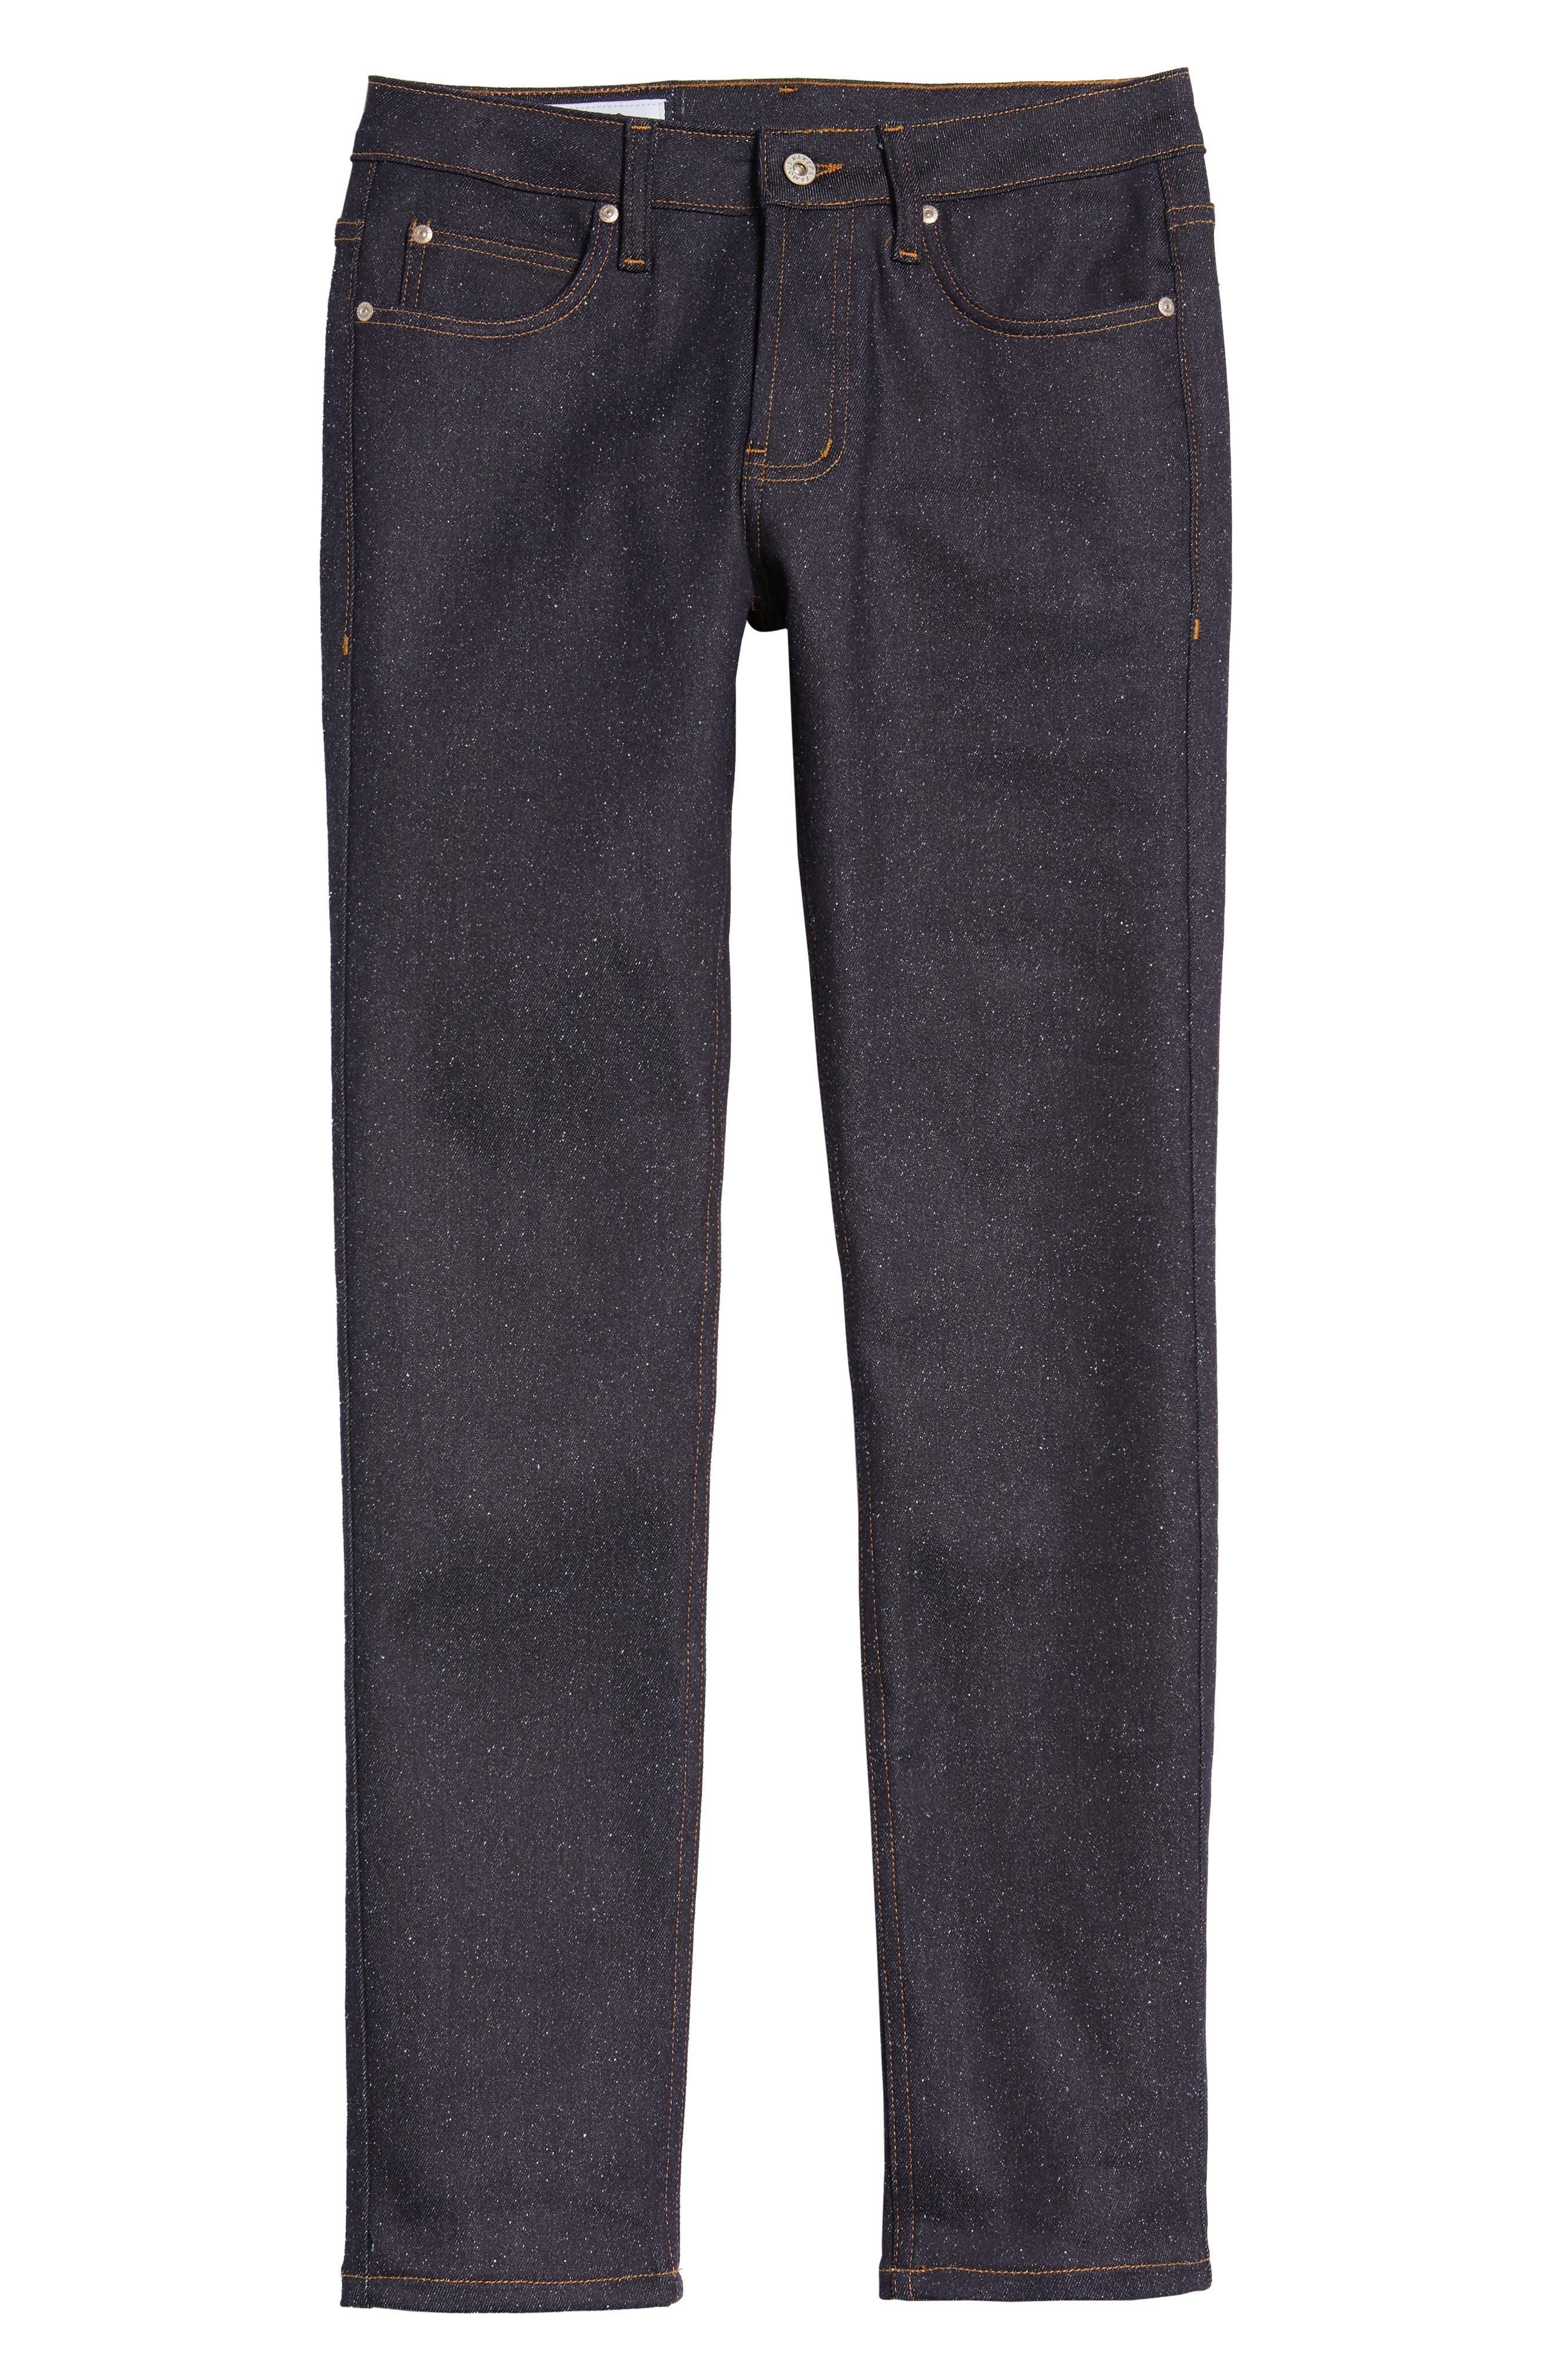 Super Skinny Guy Skinny Fit Jeans,                             Alternate thumbnail 6, color,                             401